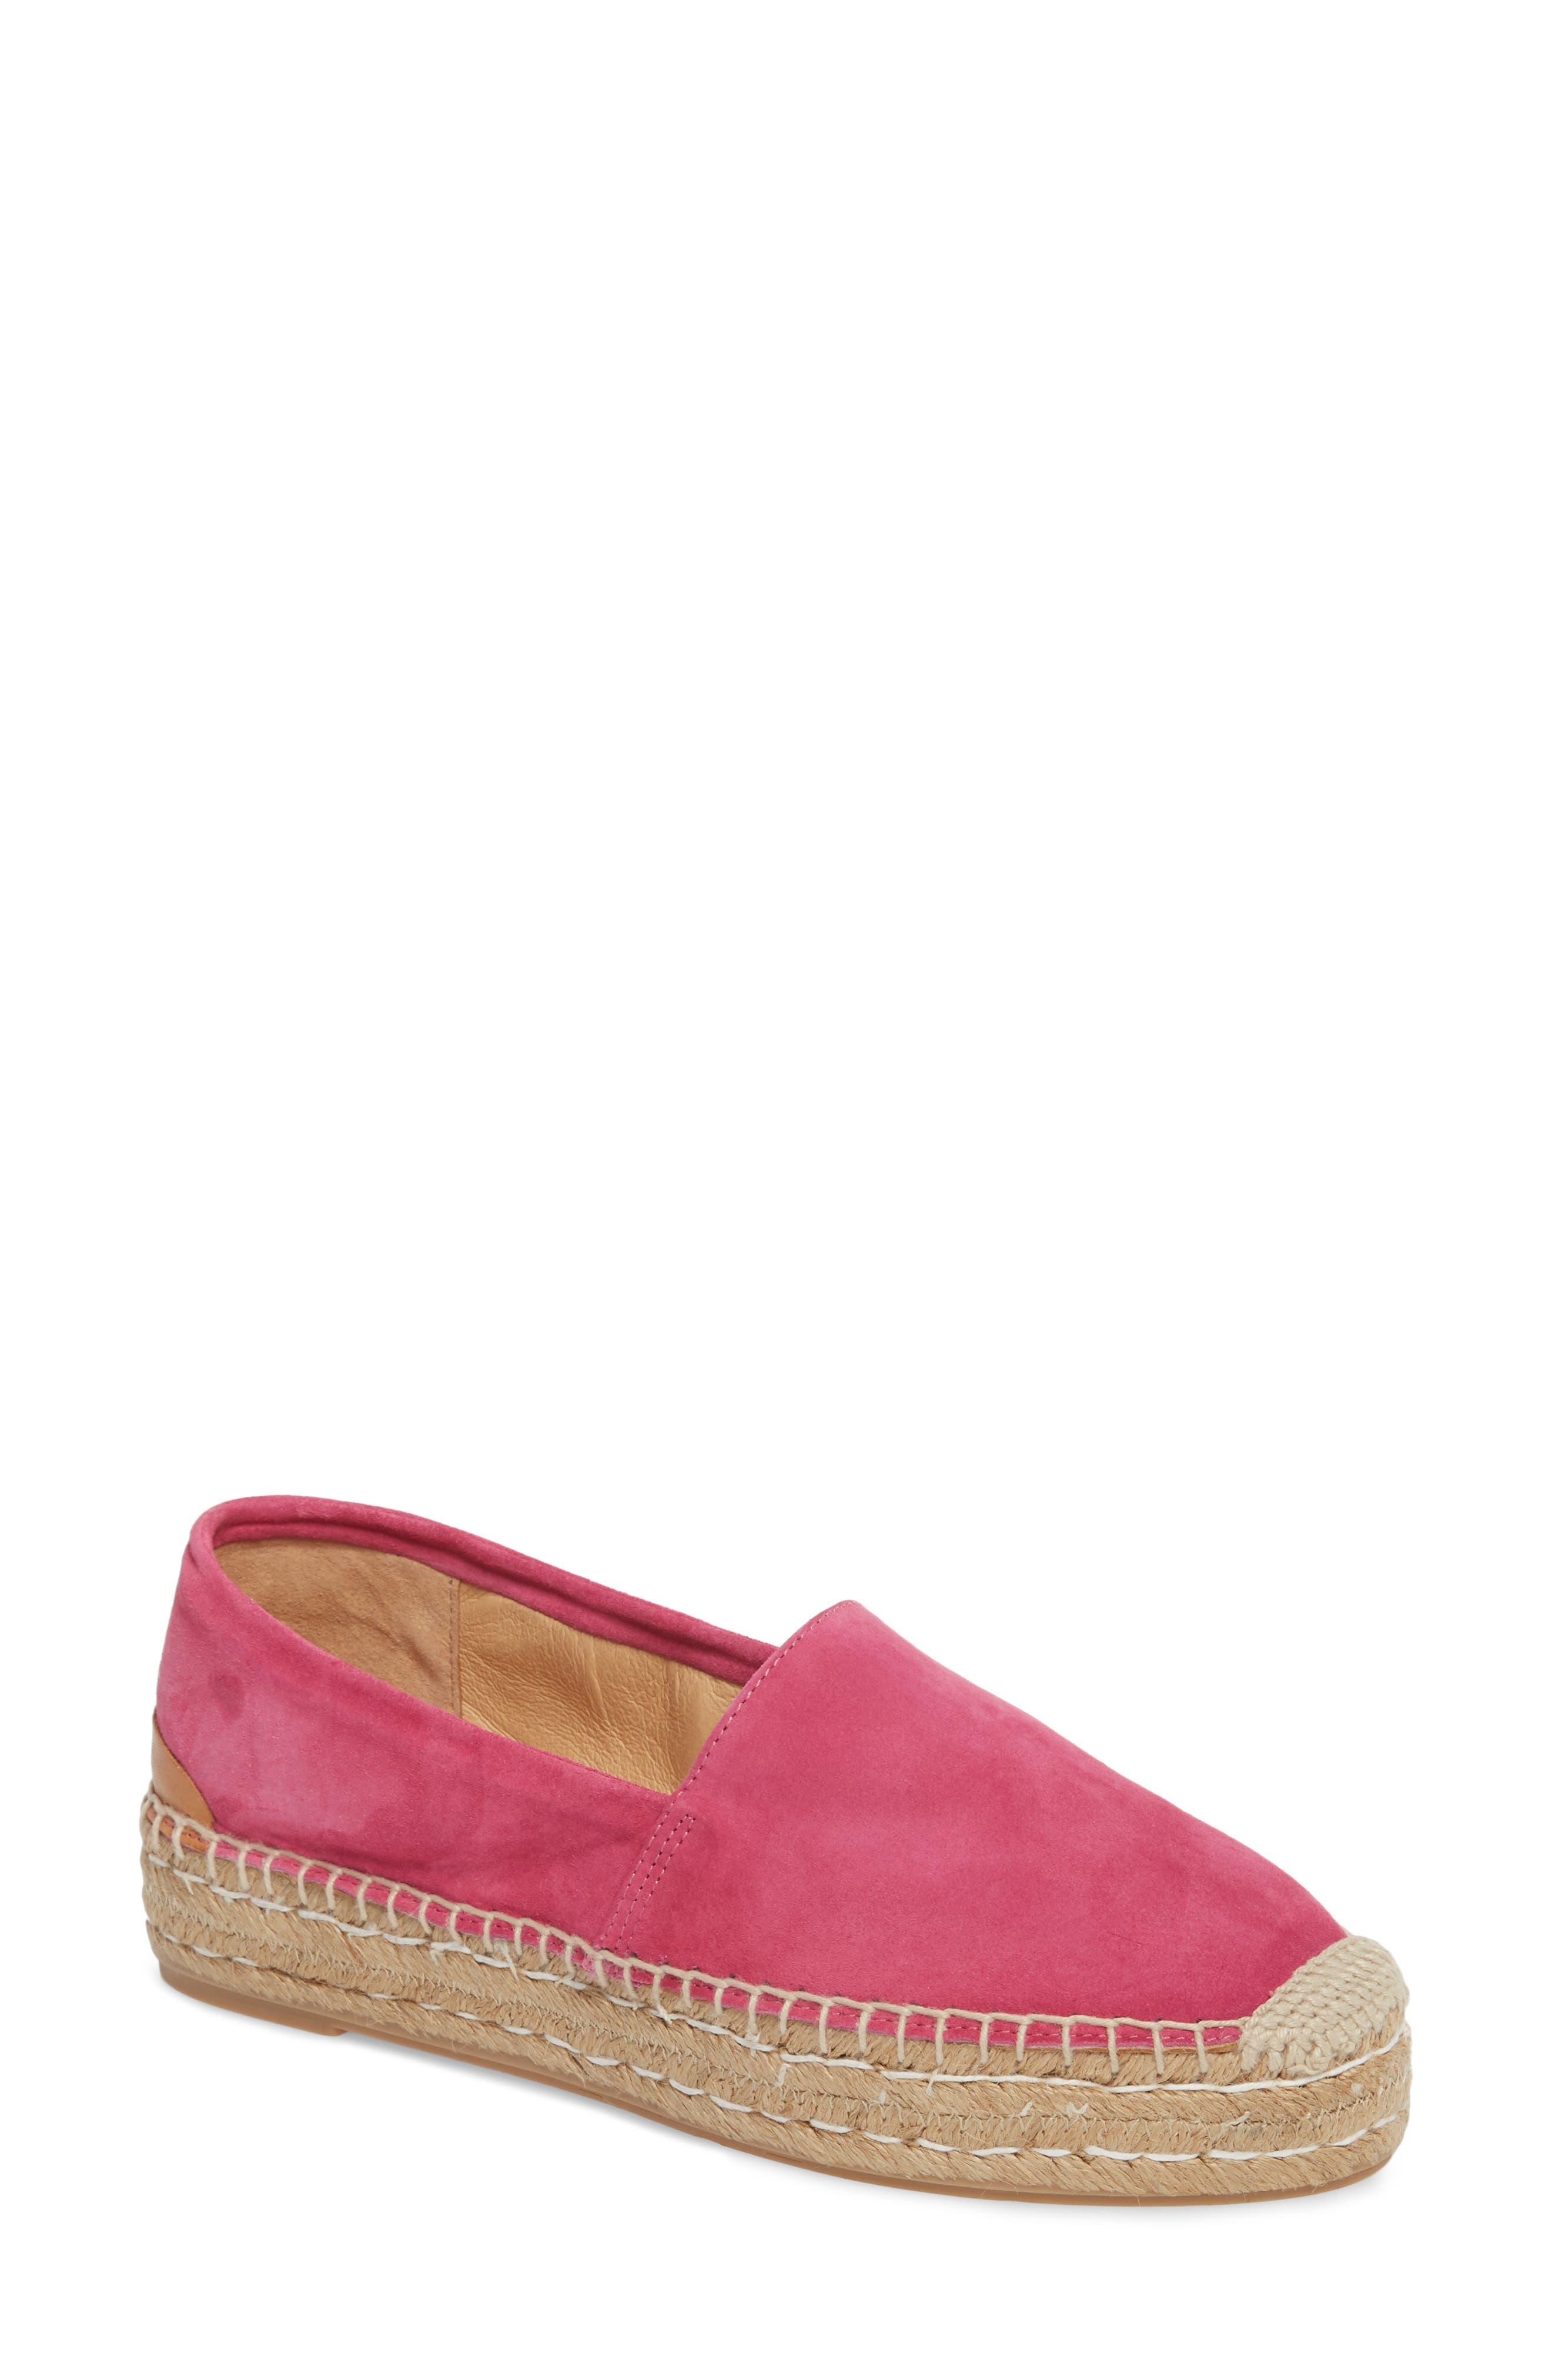 e394b9ad12e patricia green espadrilles sandals for women - Buy best women's ...